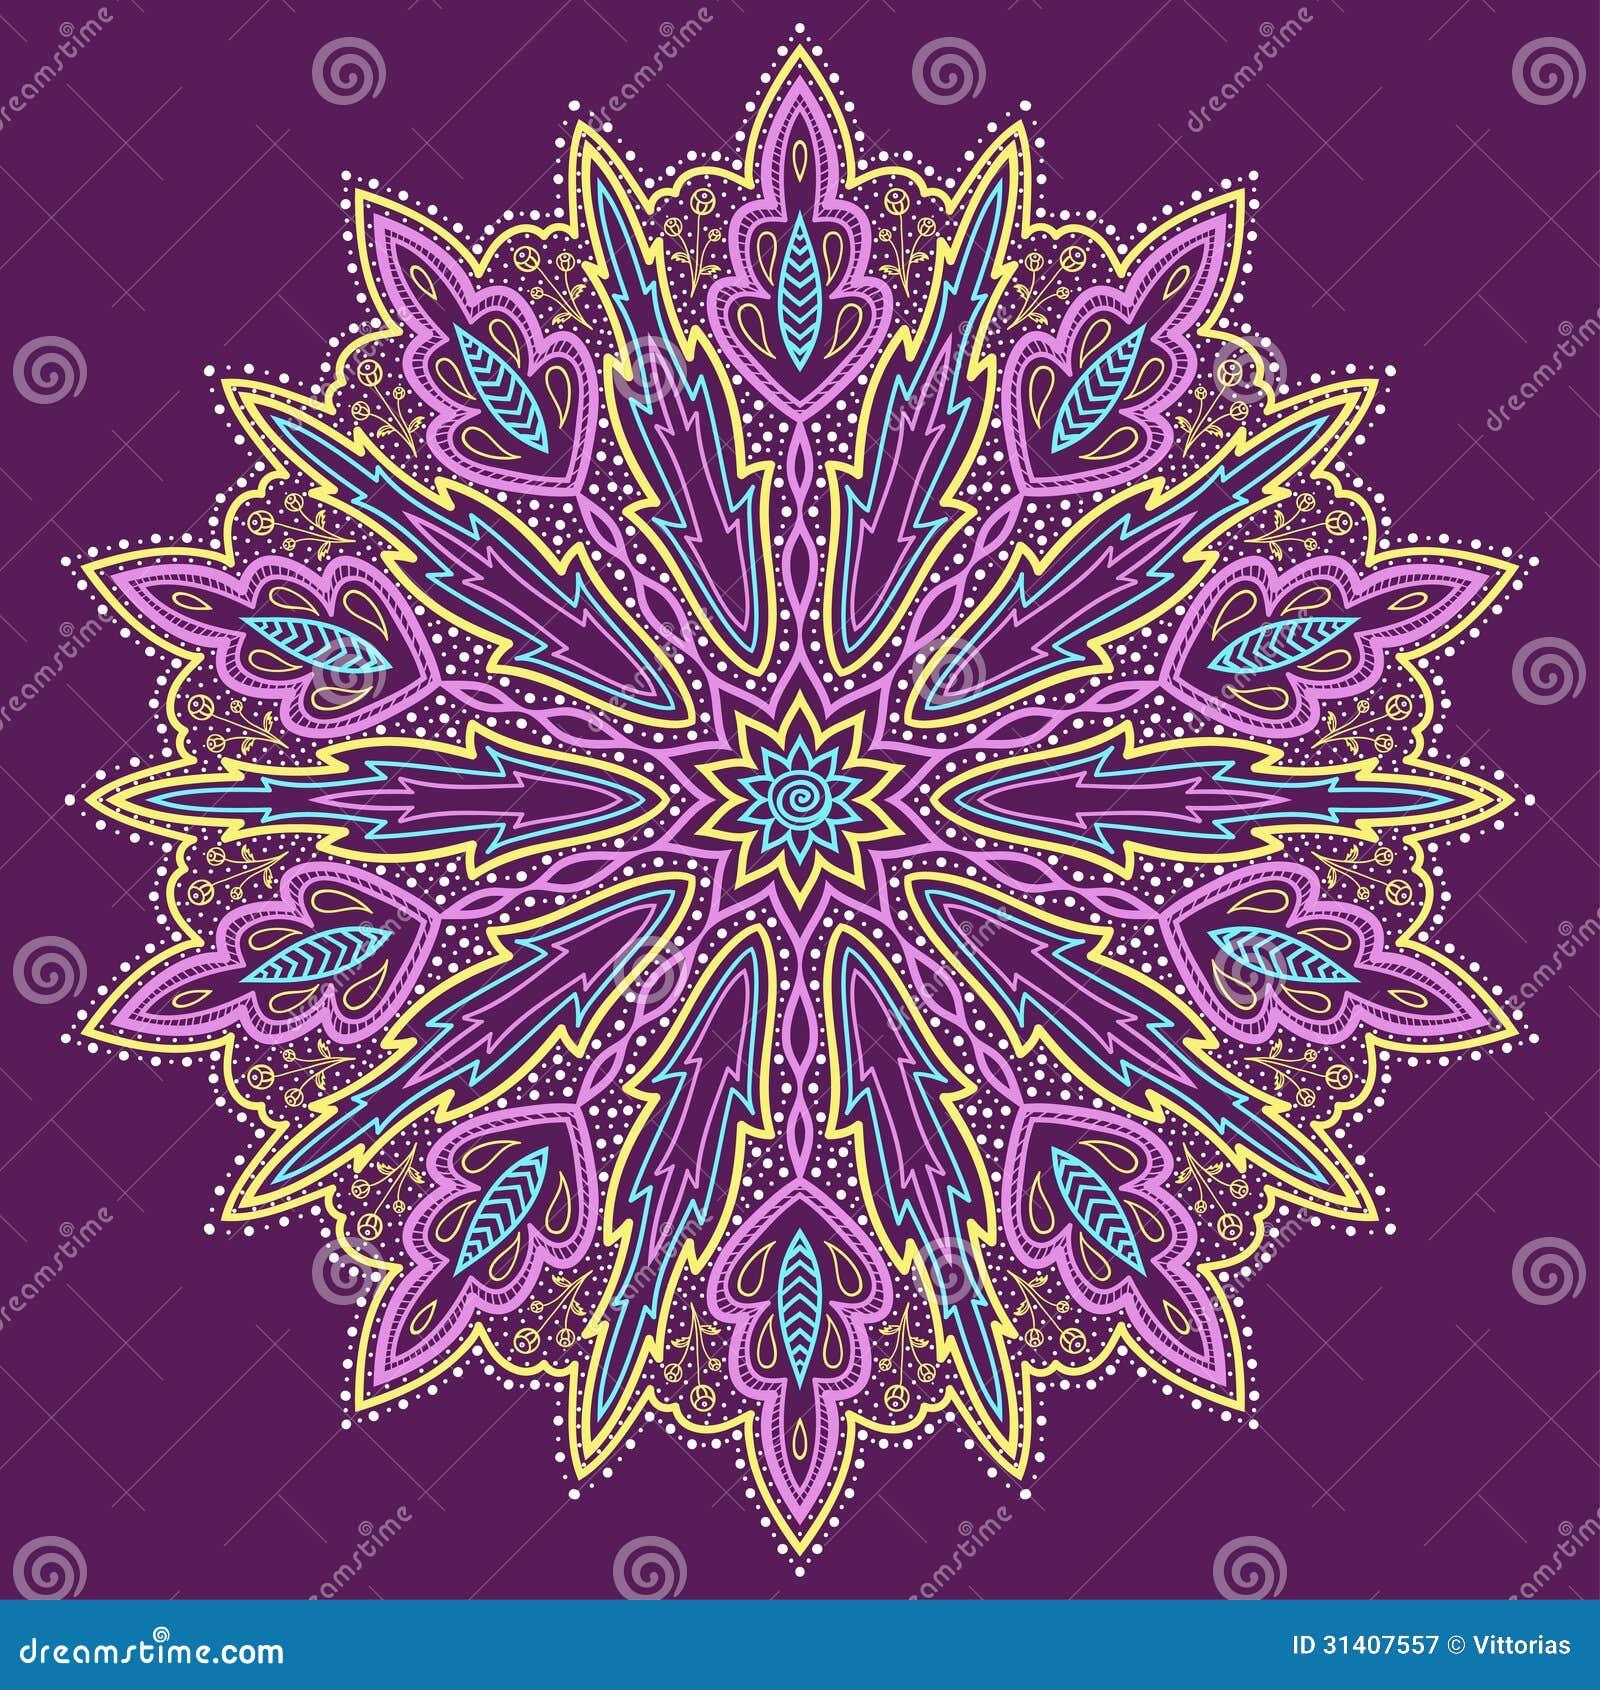 mandala mooie hand drawn bloem violette achtergrond 31407557 - Mandala Behang